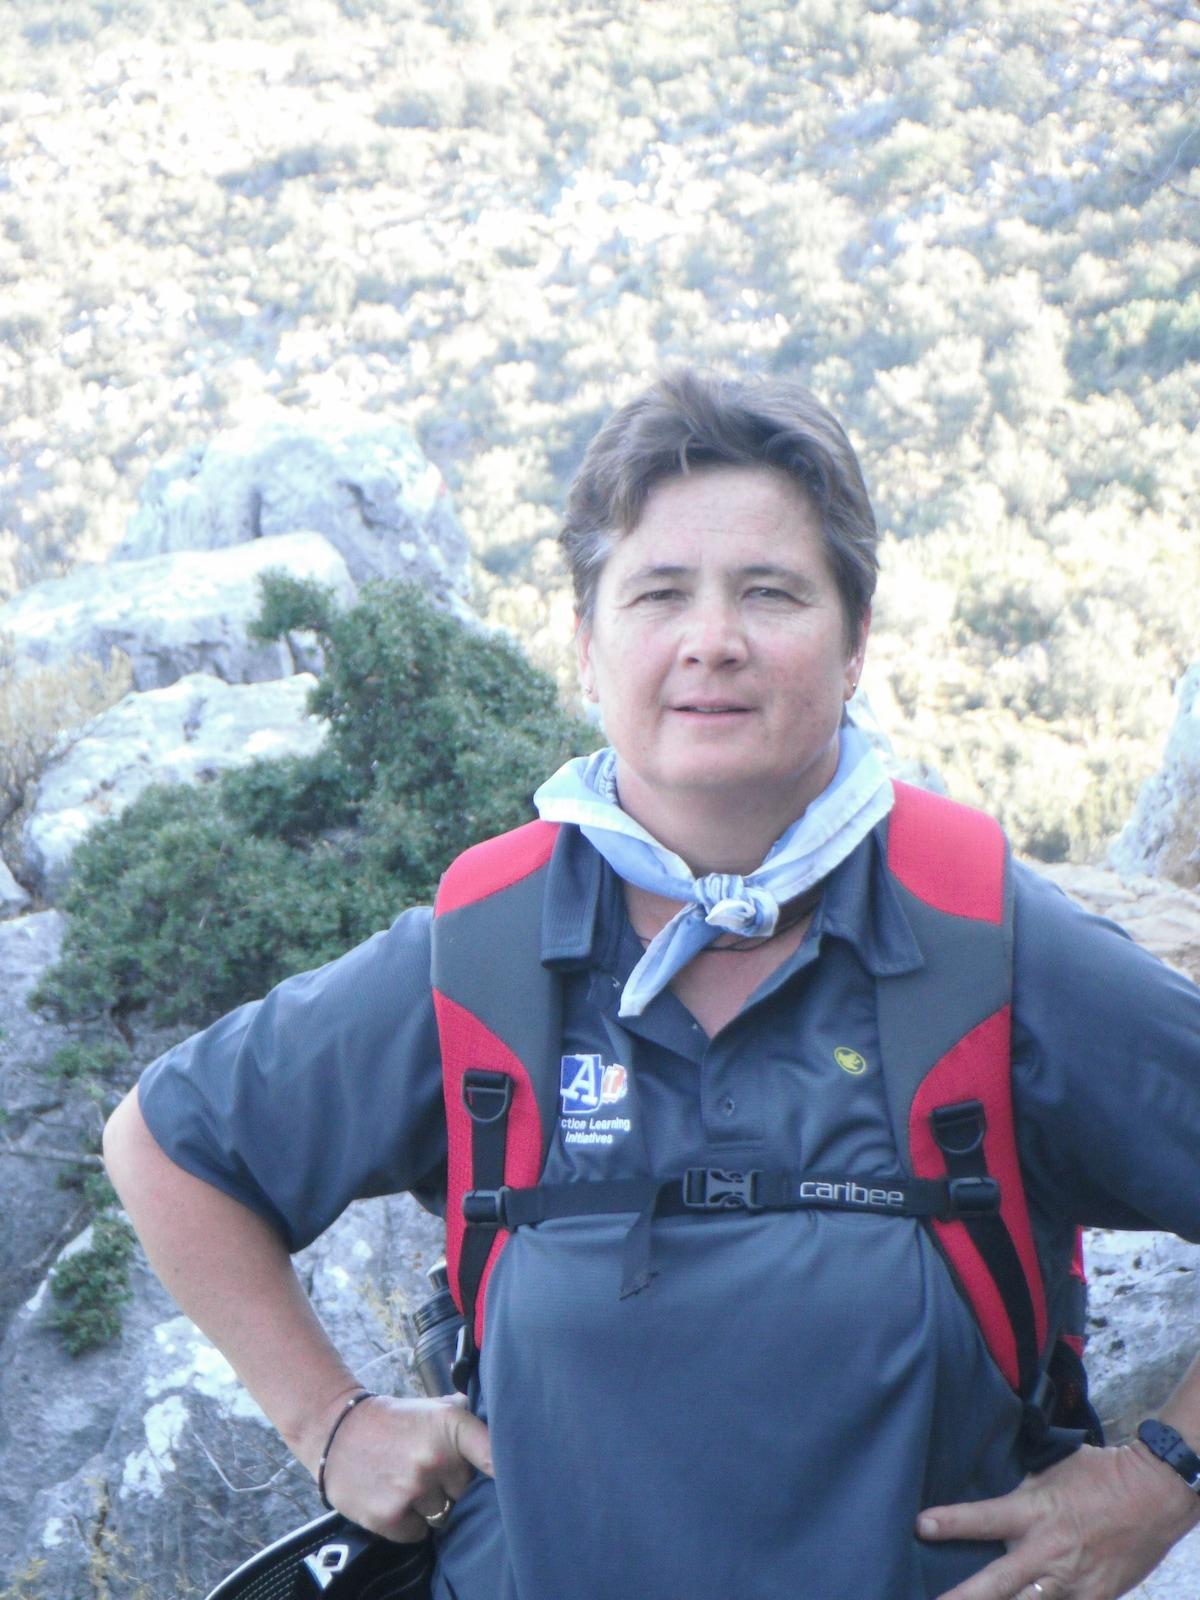 Sharon From Port Macquarie, Australia